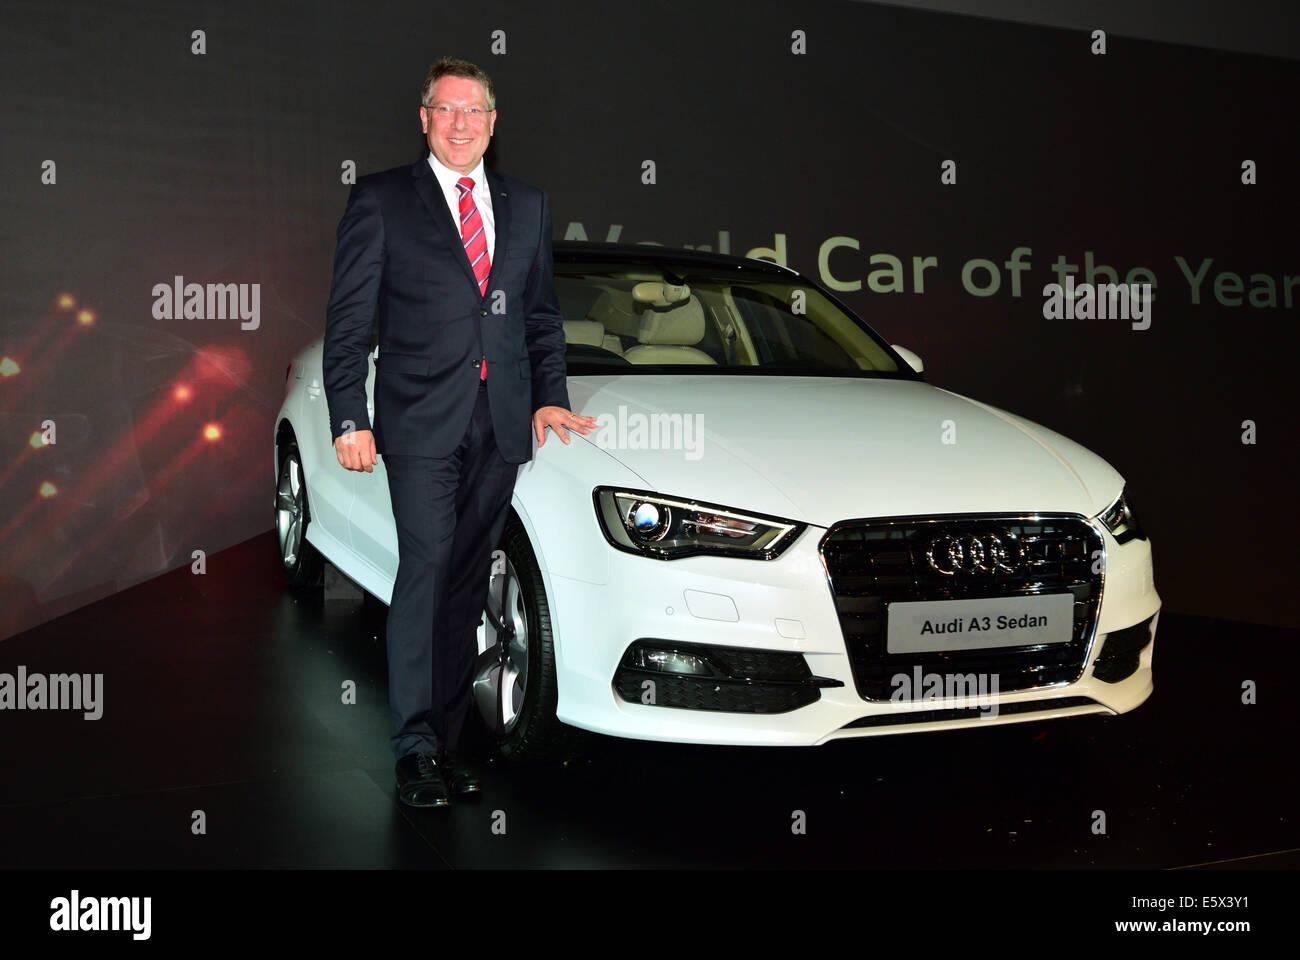 Audi India Stock Photos Audi India Stock Images Alamy - Audi india